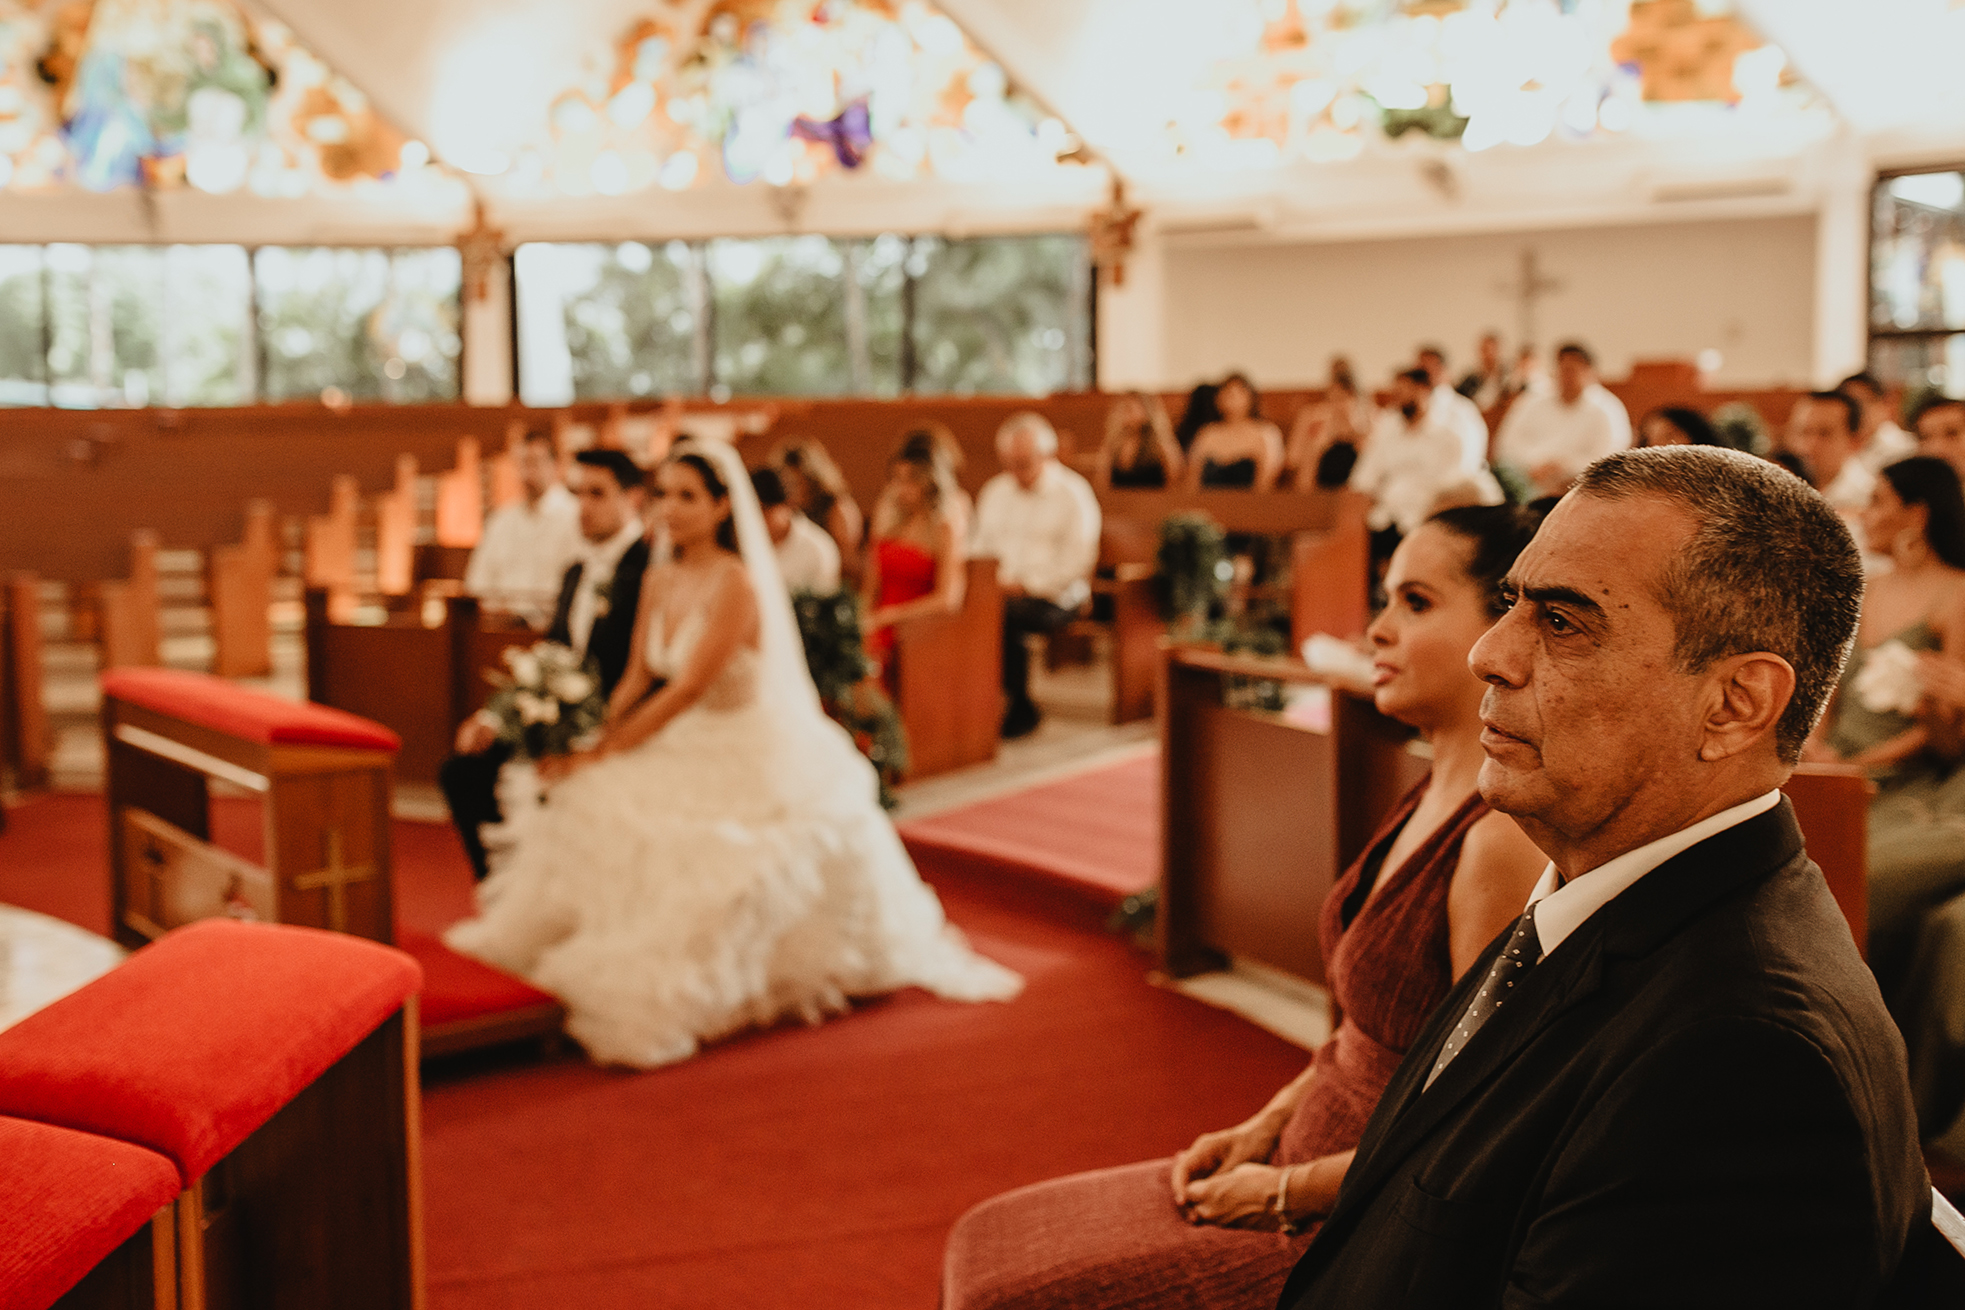 0602R&F__WeddingDestination_Weddingmerida_BodaMexico_FotografoDeBodas_FabrizioSimoneenFotografo.jpg